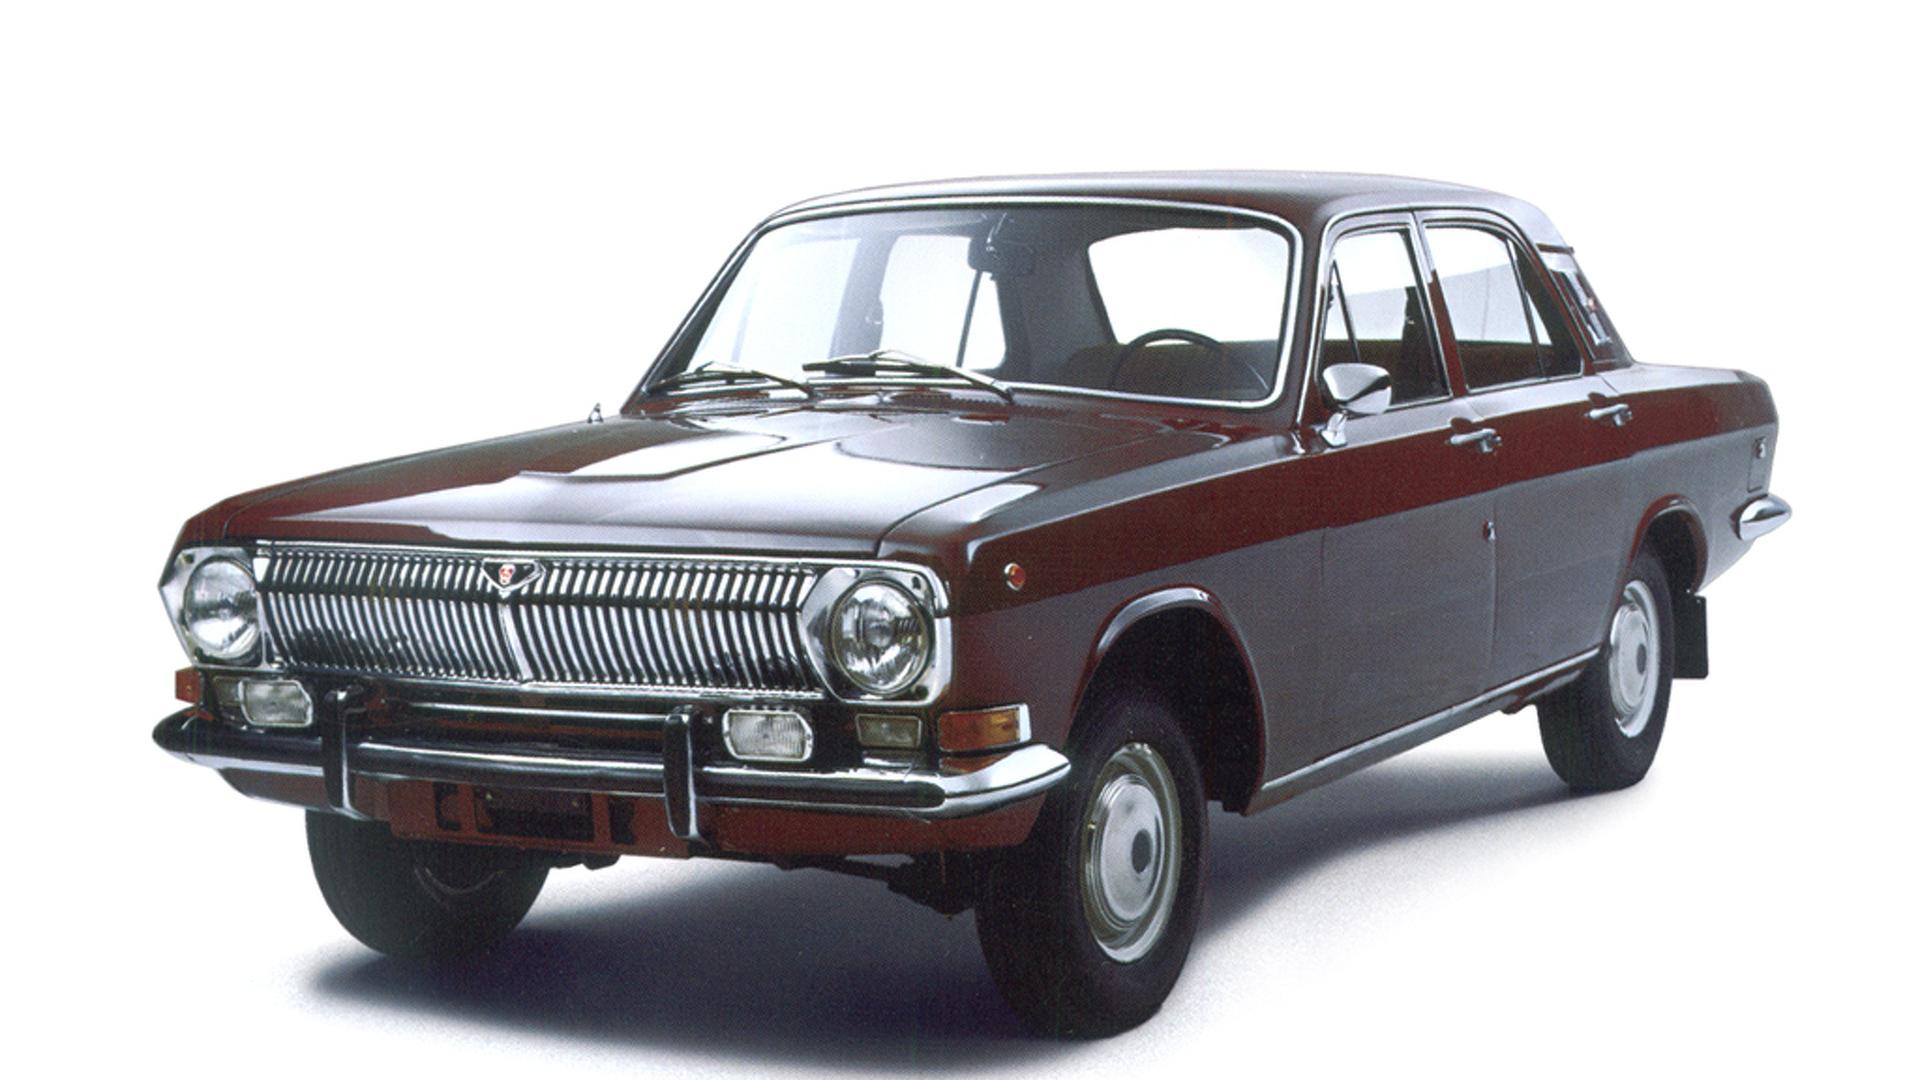 GAZ Volga – sinonim za istočnu limuzinu